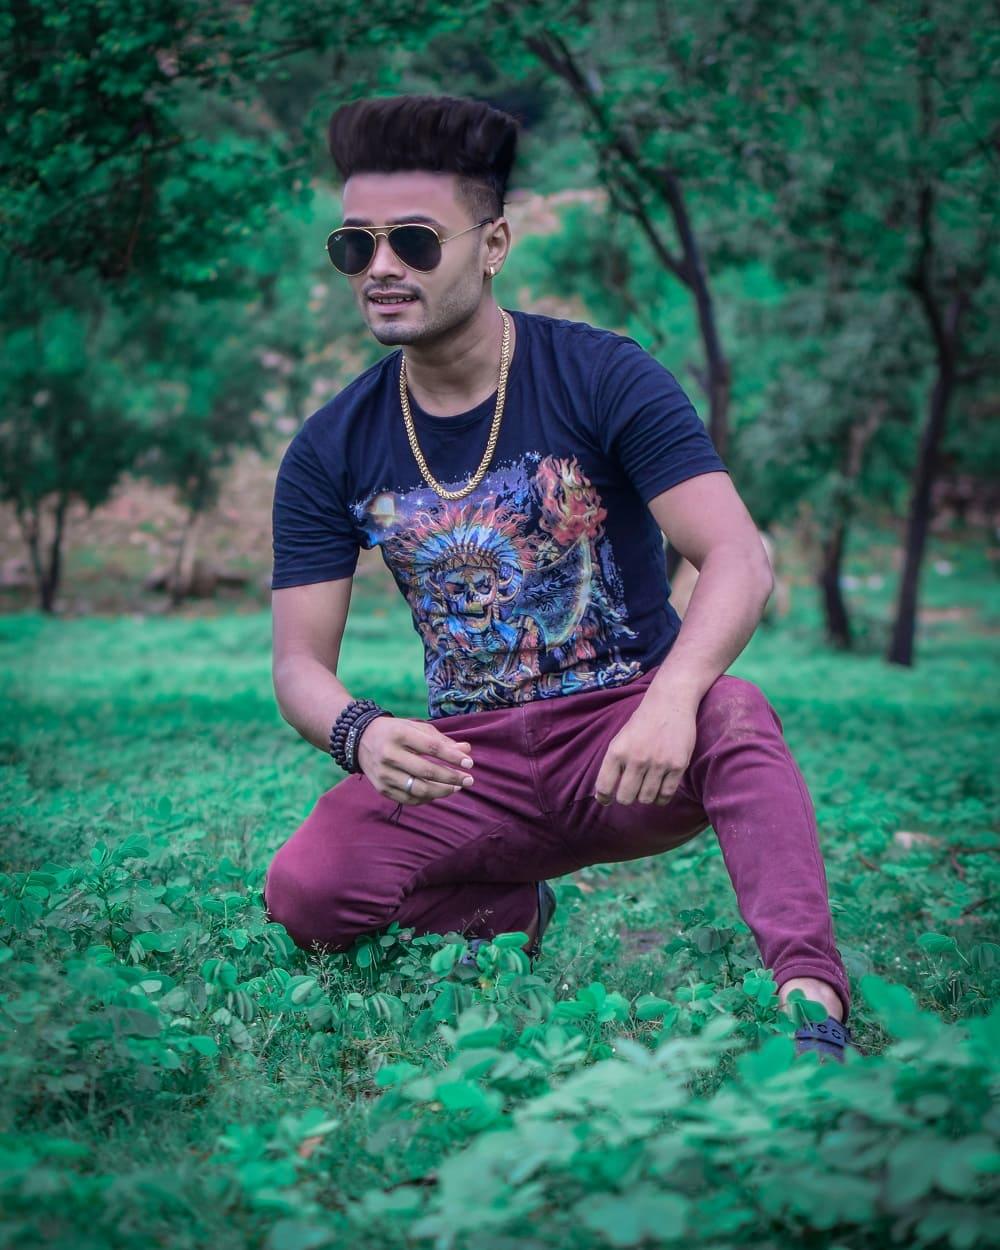 Gulshan Kumar (Stunt Man) Wiki, Age, Biography, Hobbies & More 3